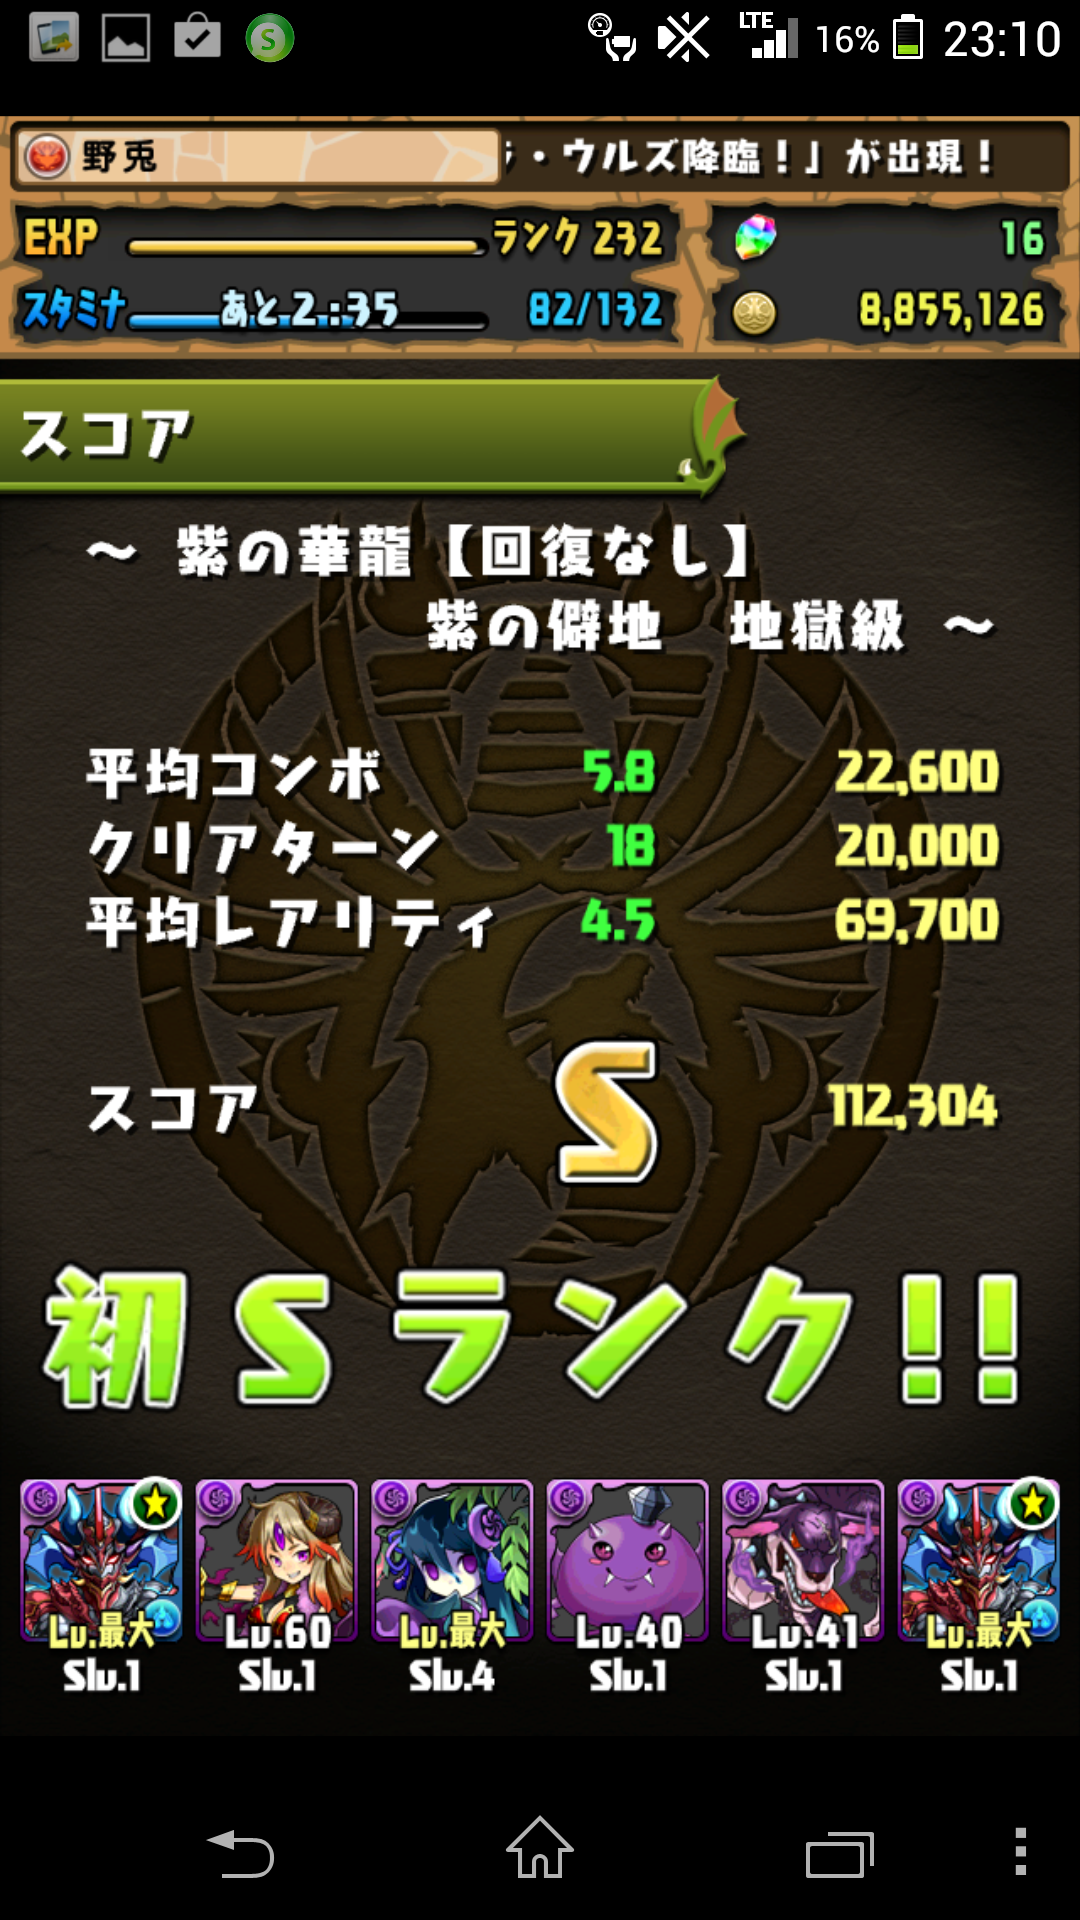 Screenshot_2014-04-22-23-10-07.png